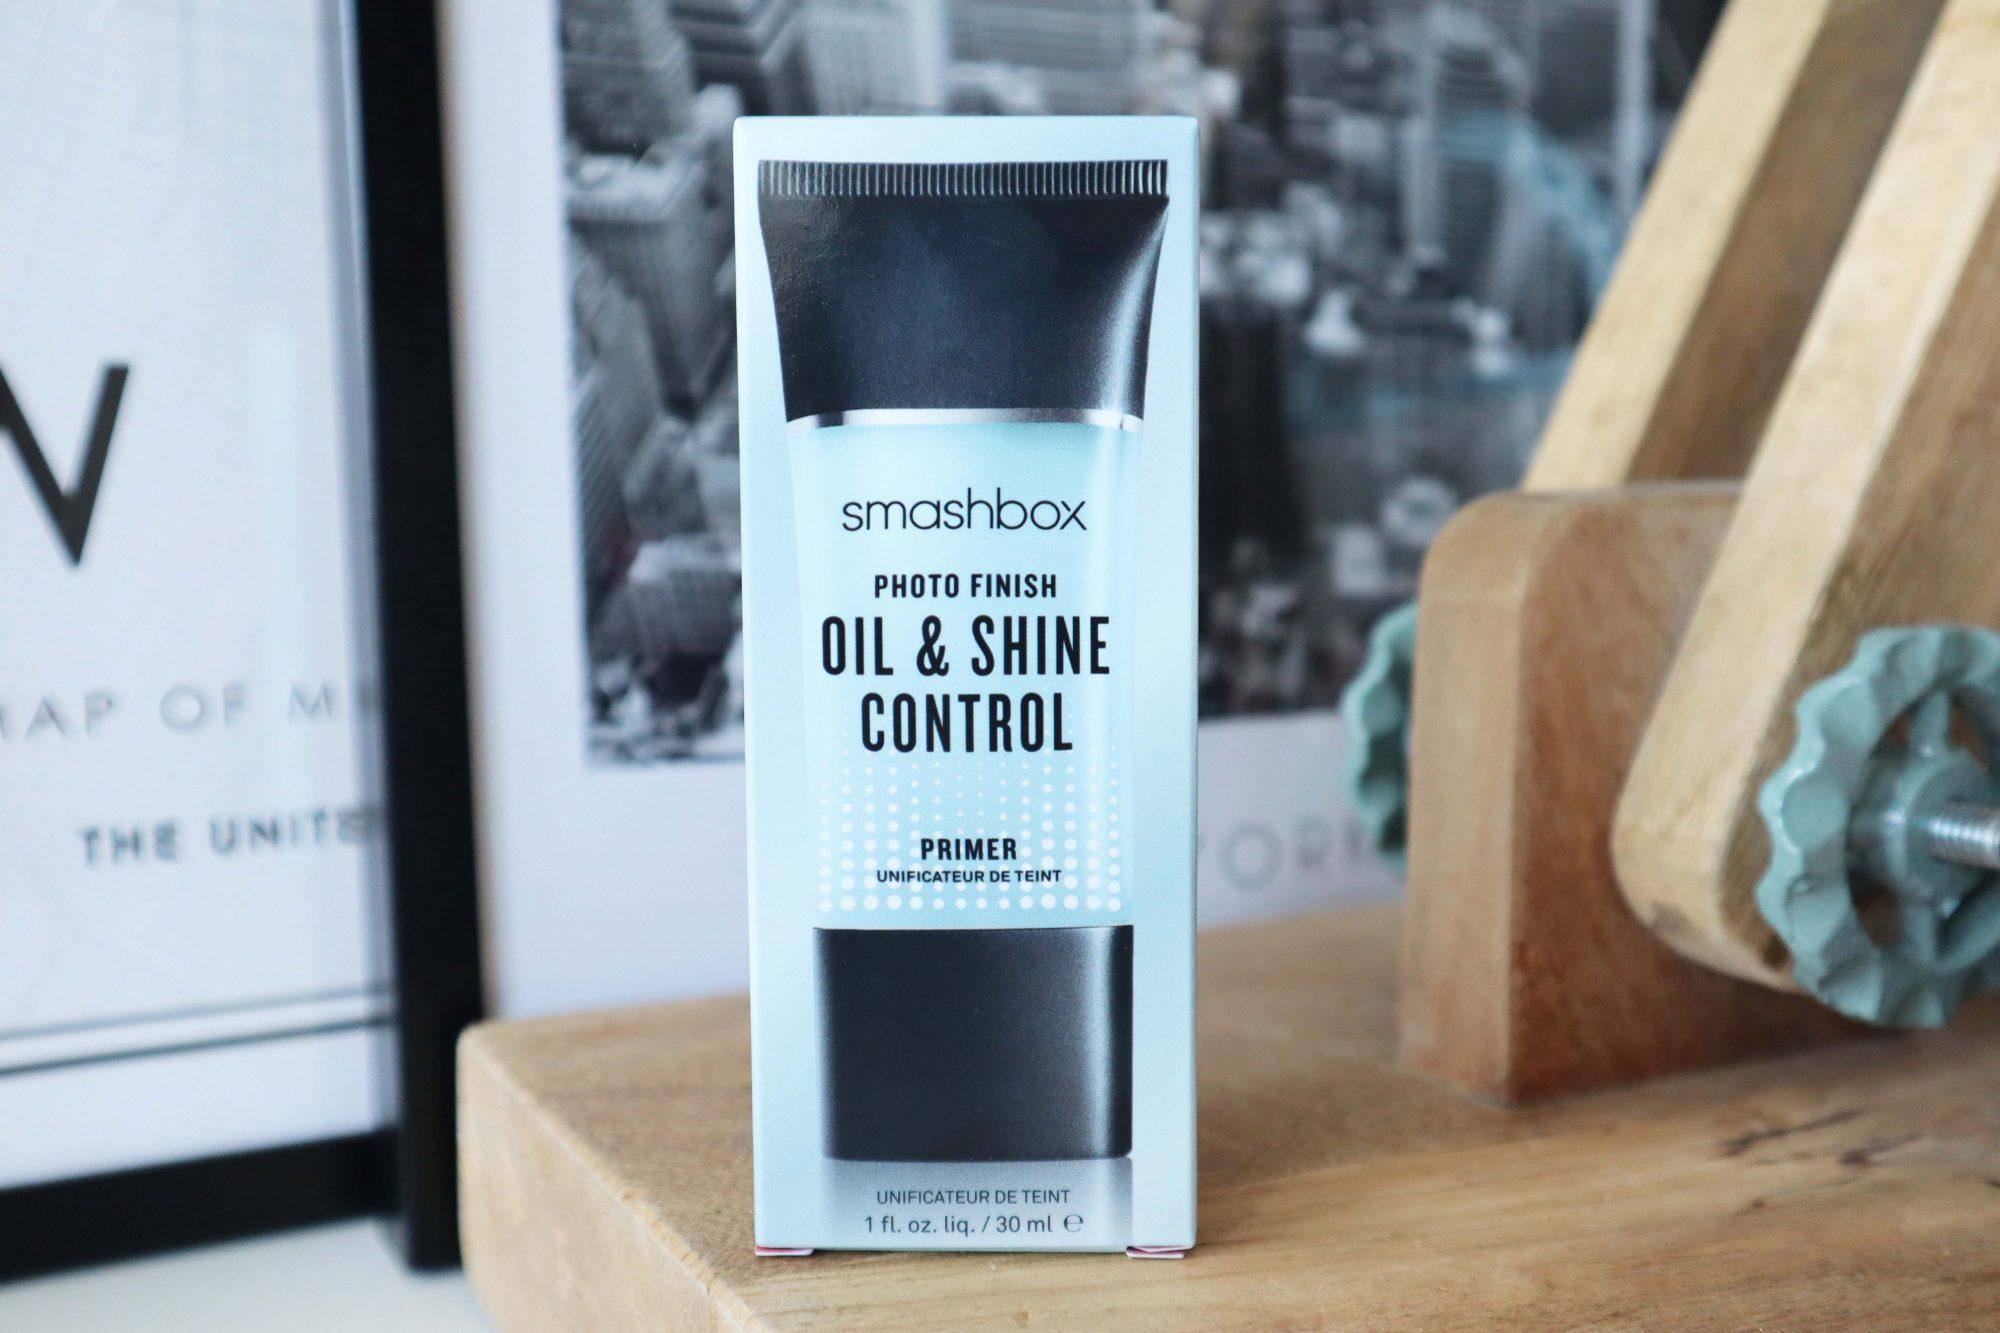 Smashbox Photo Finish Oil & Shine Control